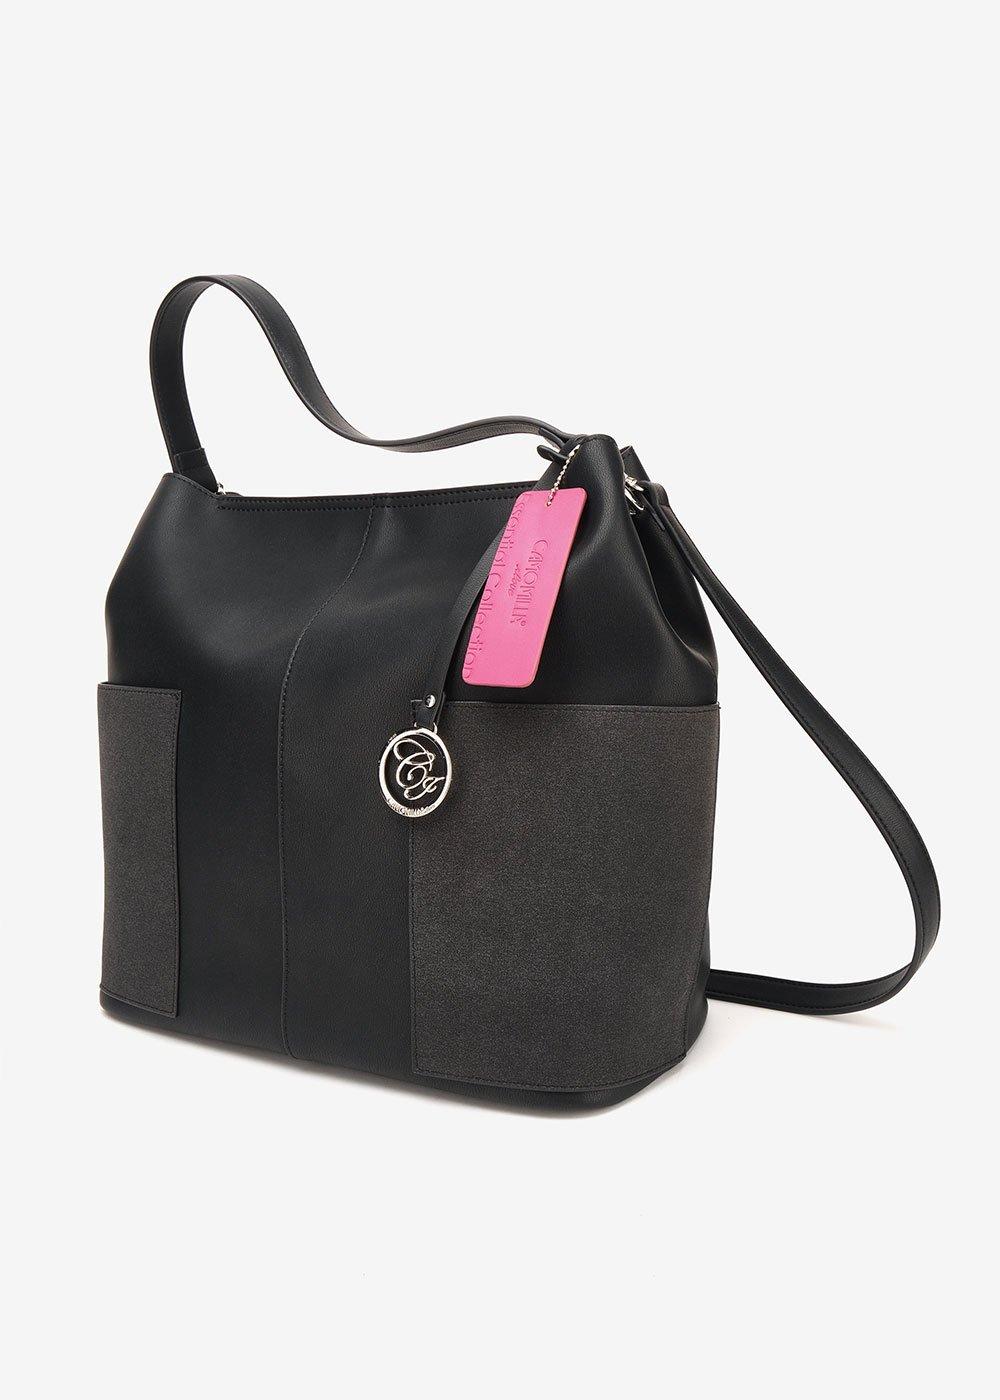 Shopping bag Beryl modello sacca - Black - Donna